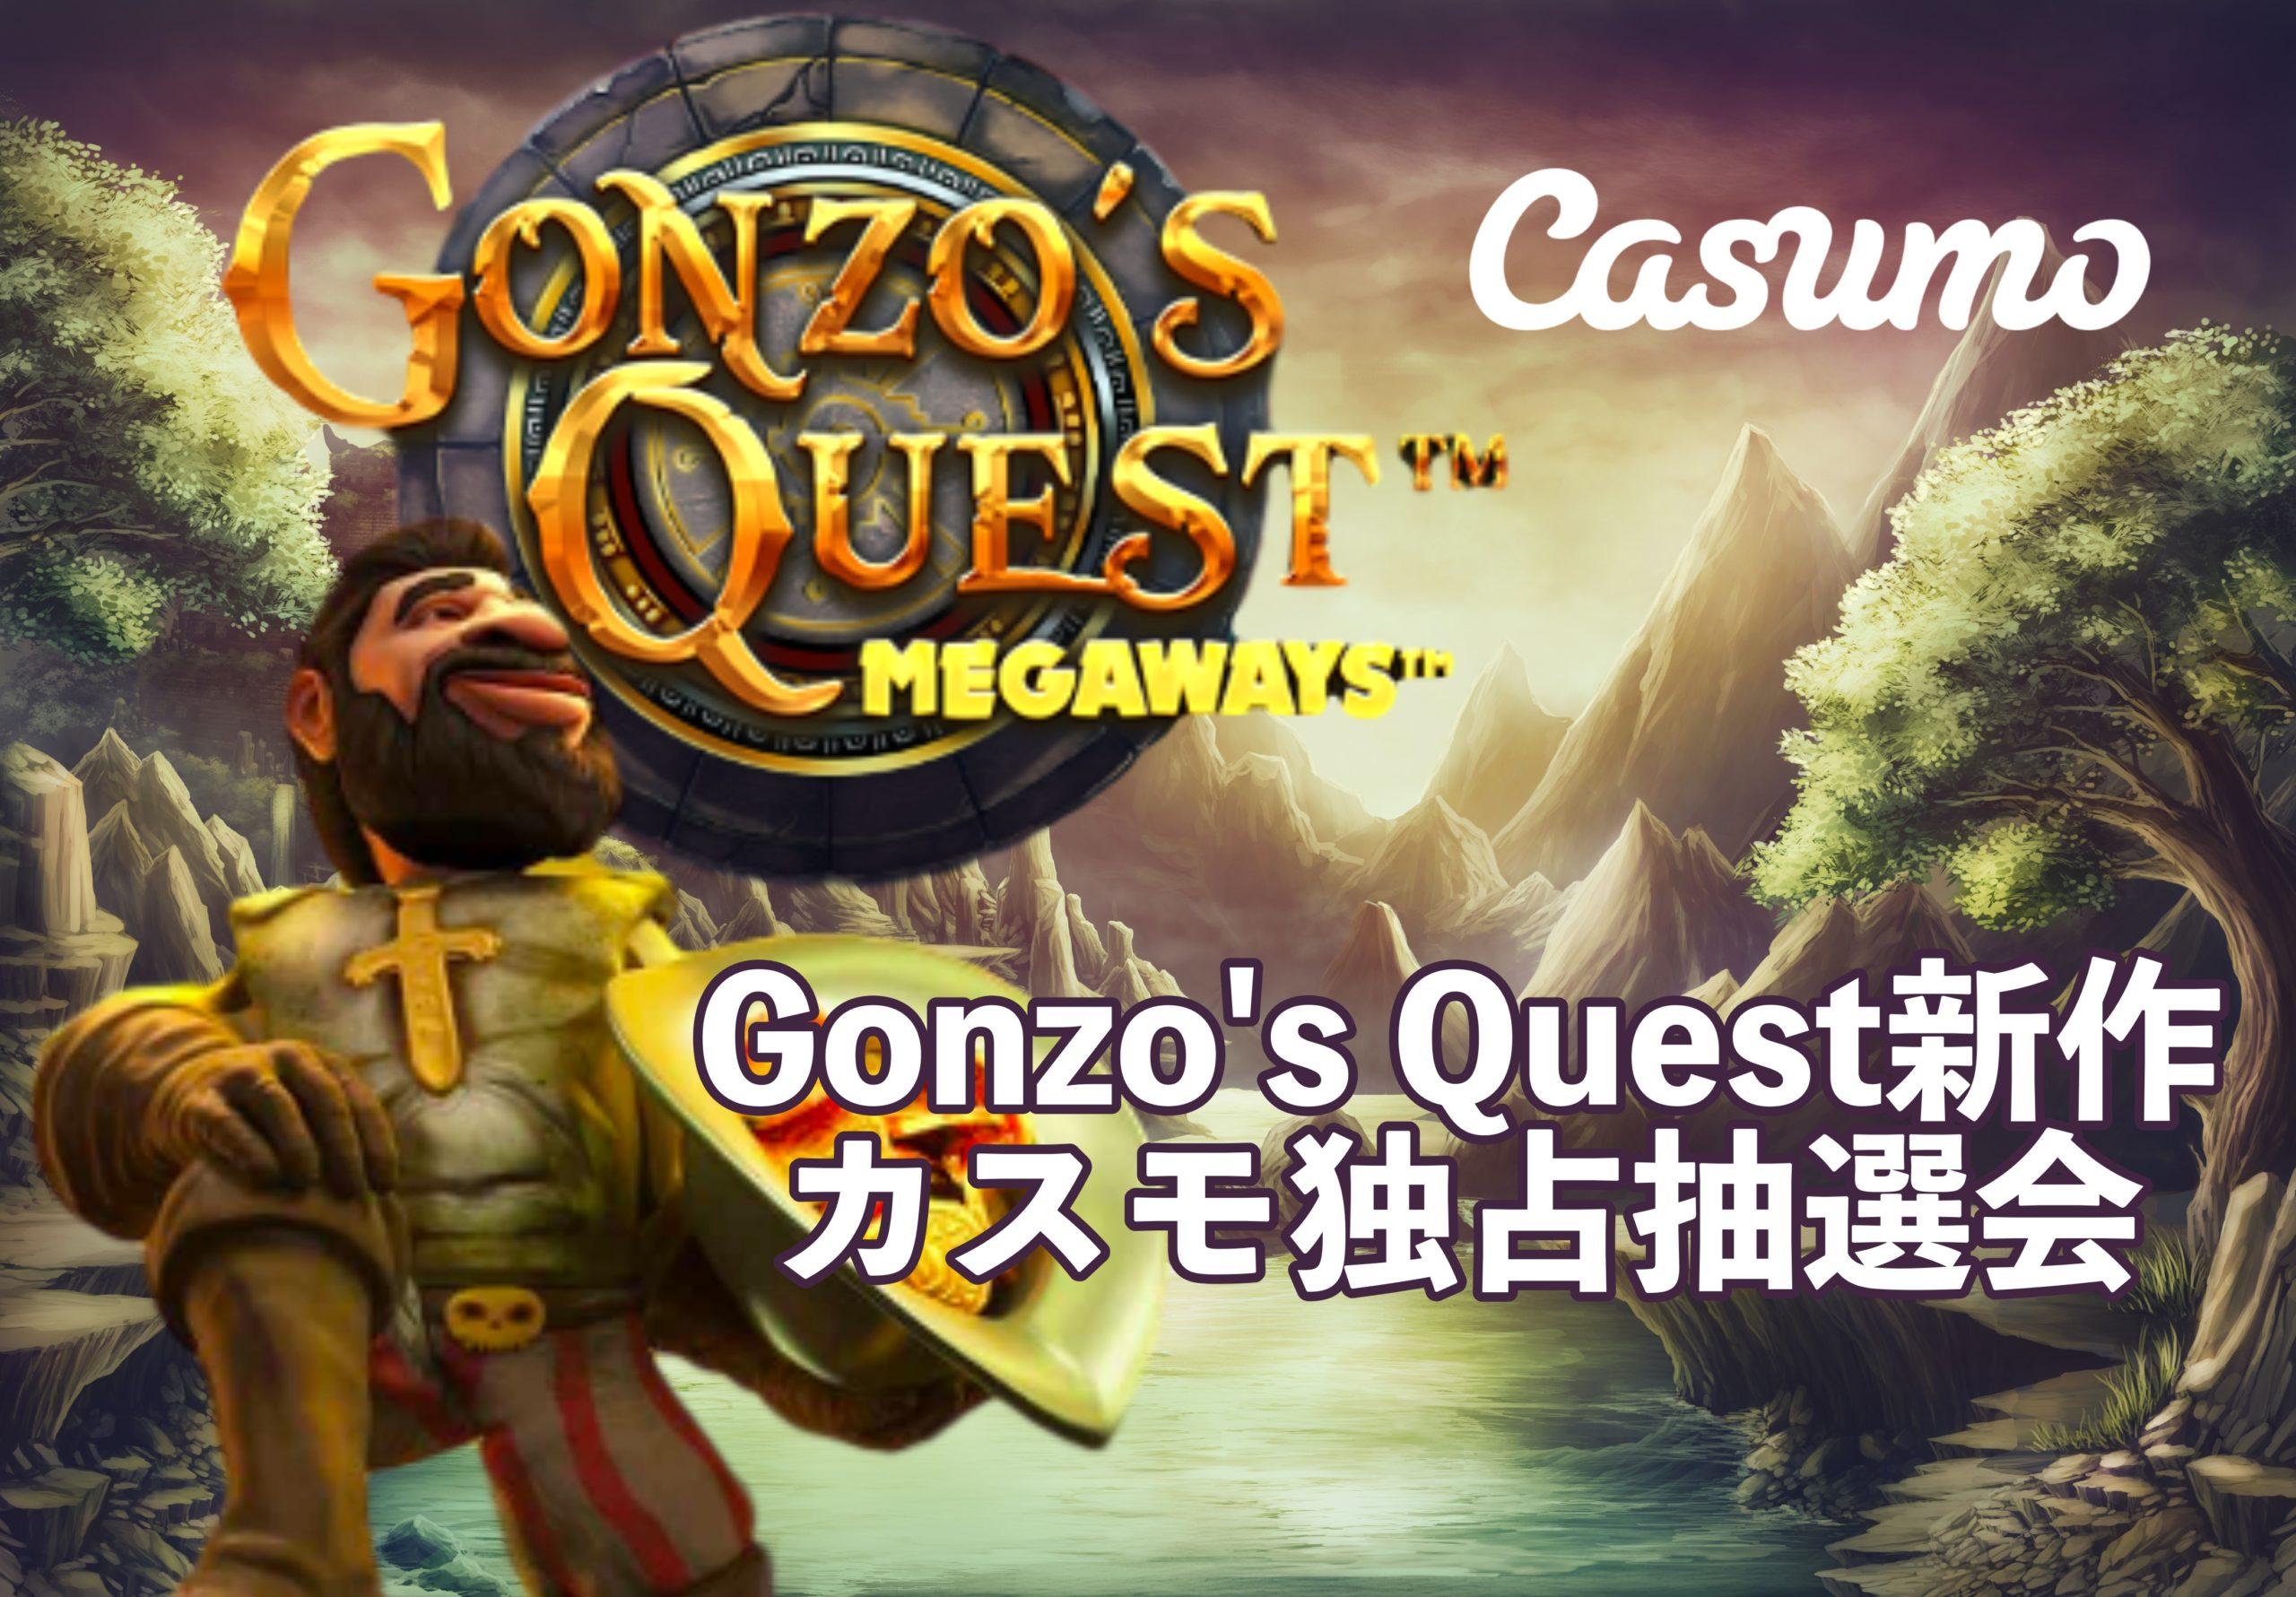 Gonzo's Questシリーズ新作リリース記念 賞金総額$5,000のカスモ独占抽選会が開催!